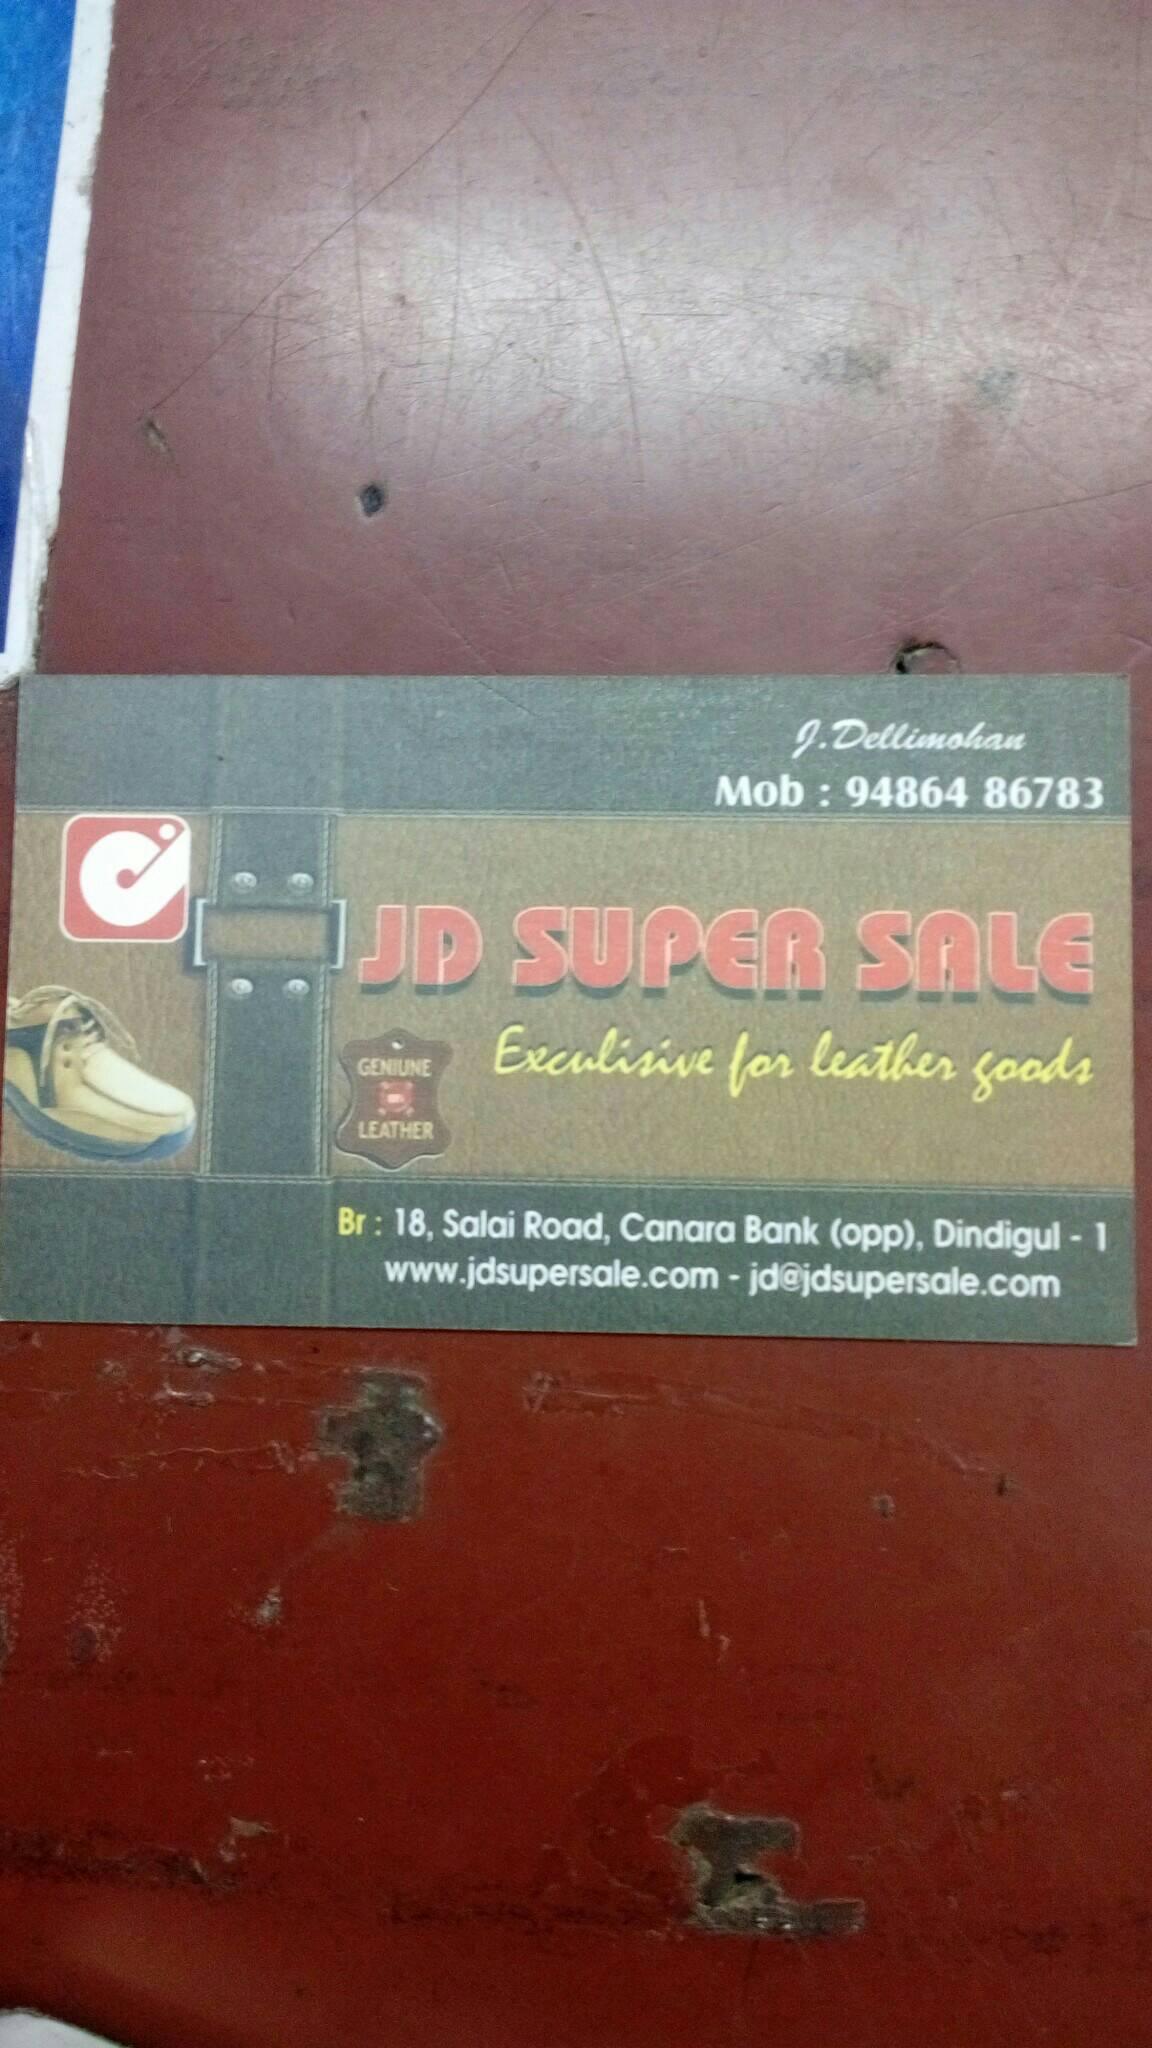 JD Super Sale 9486486783